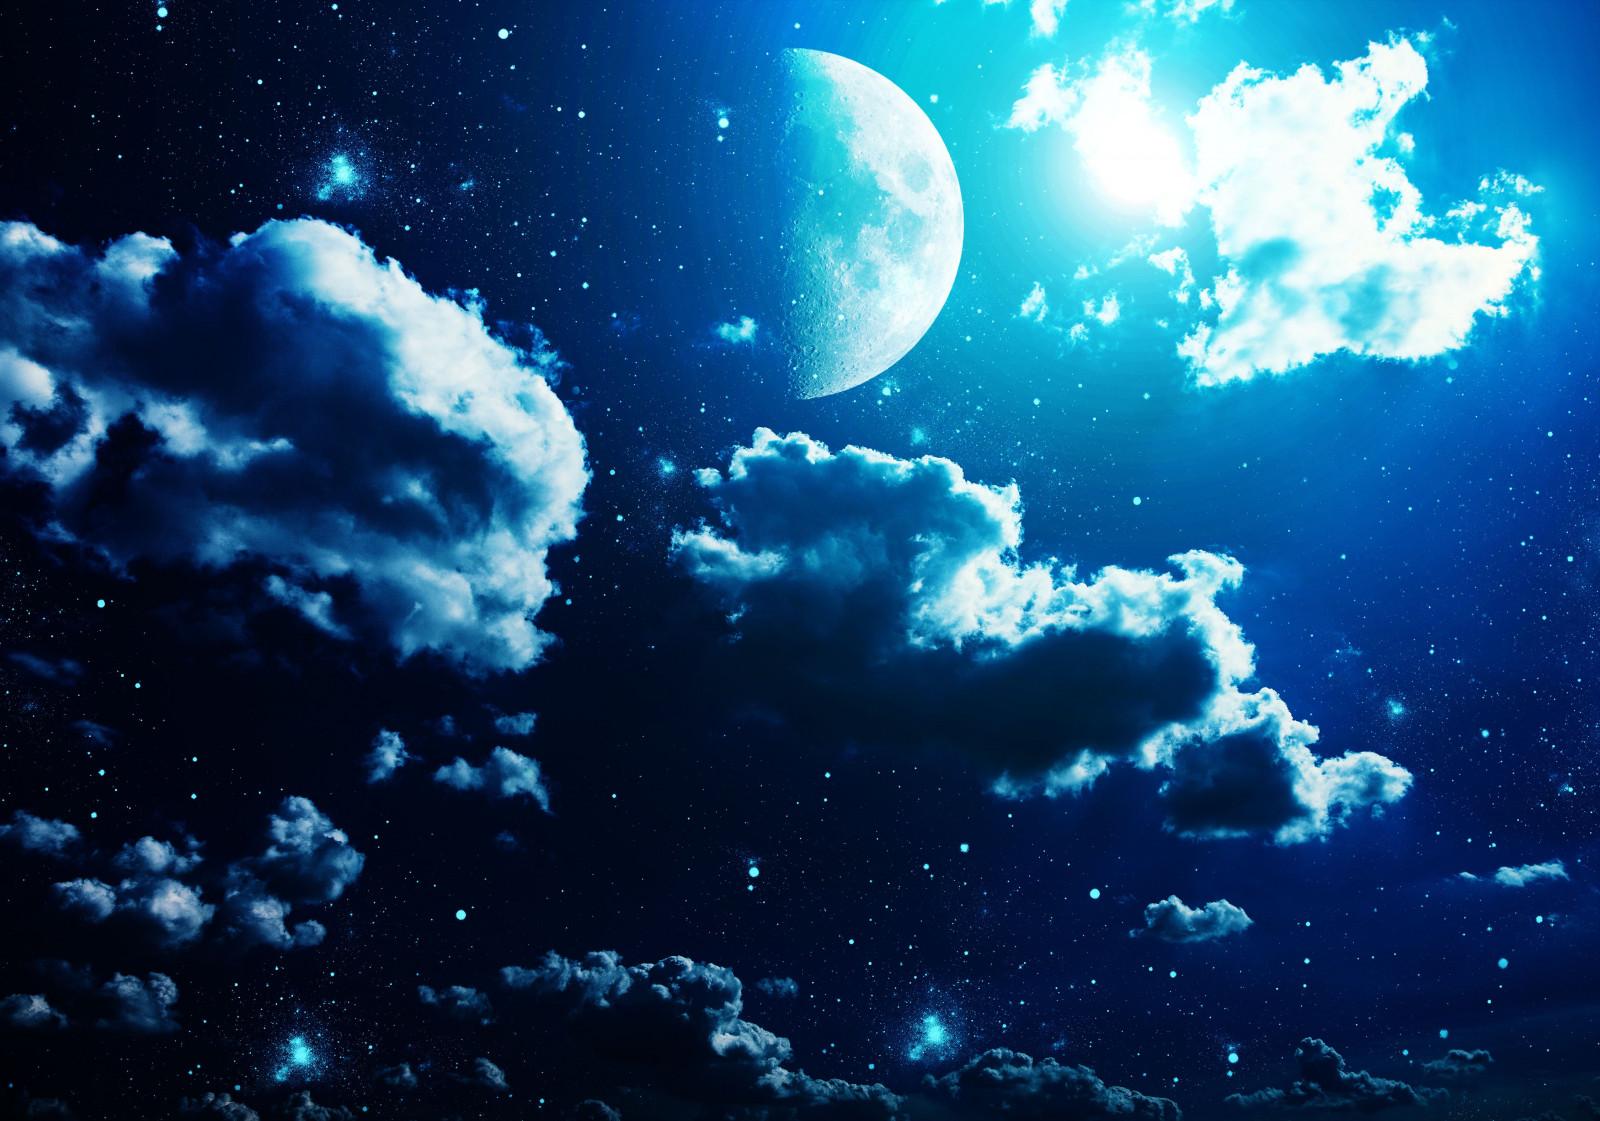 Луна и звезды картинки на рабочий стол